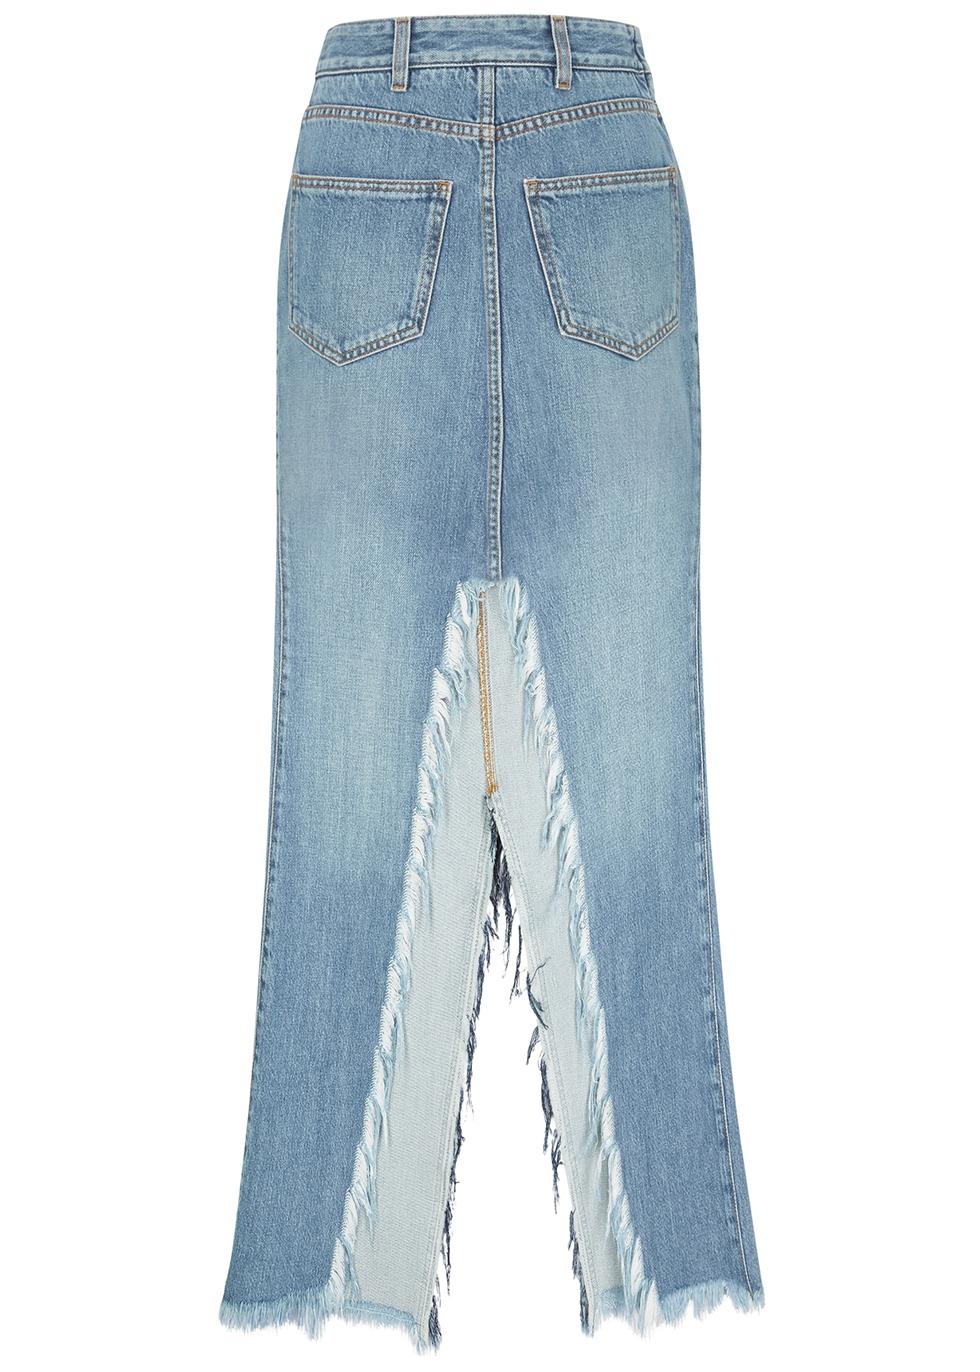 Blue denim maxi skirt